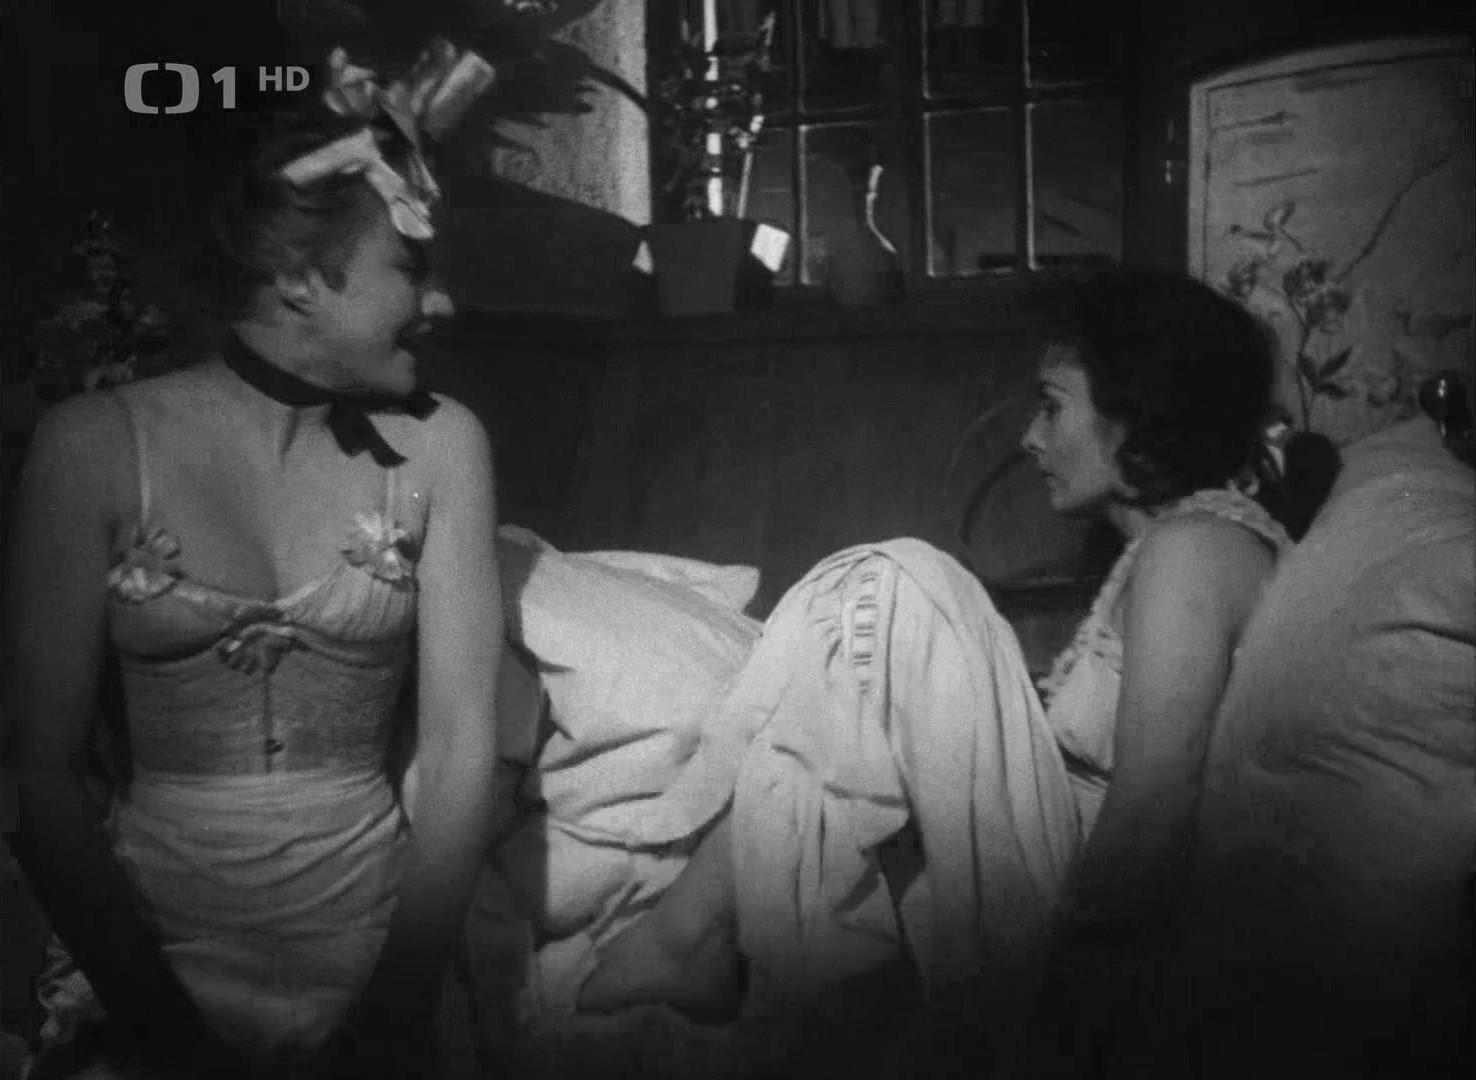 Jack Lambert (1899?976),Leomie Anderson GBR 4 2015?resent XXX nude Natalie Casey (born 1980),Emily Lloyd (born 1970)